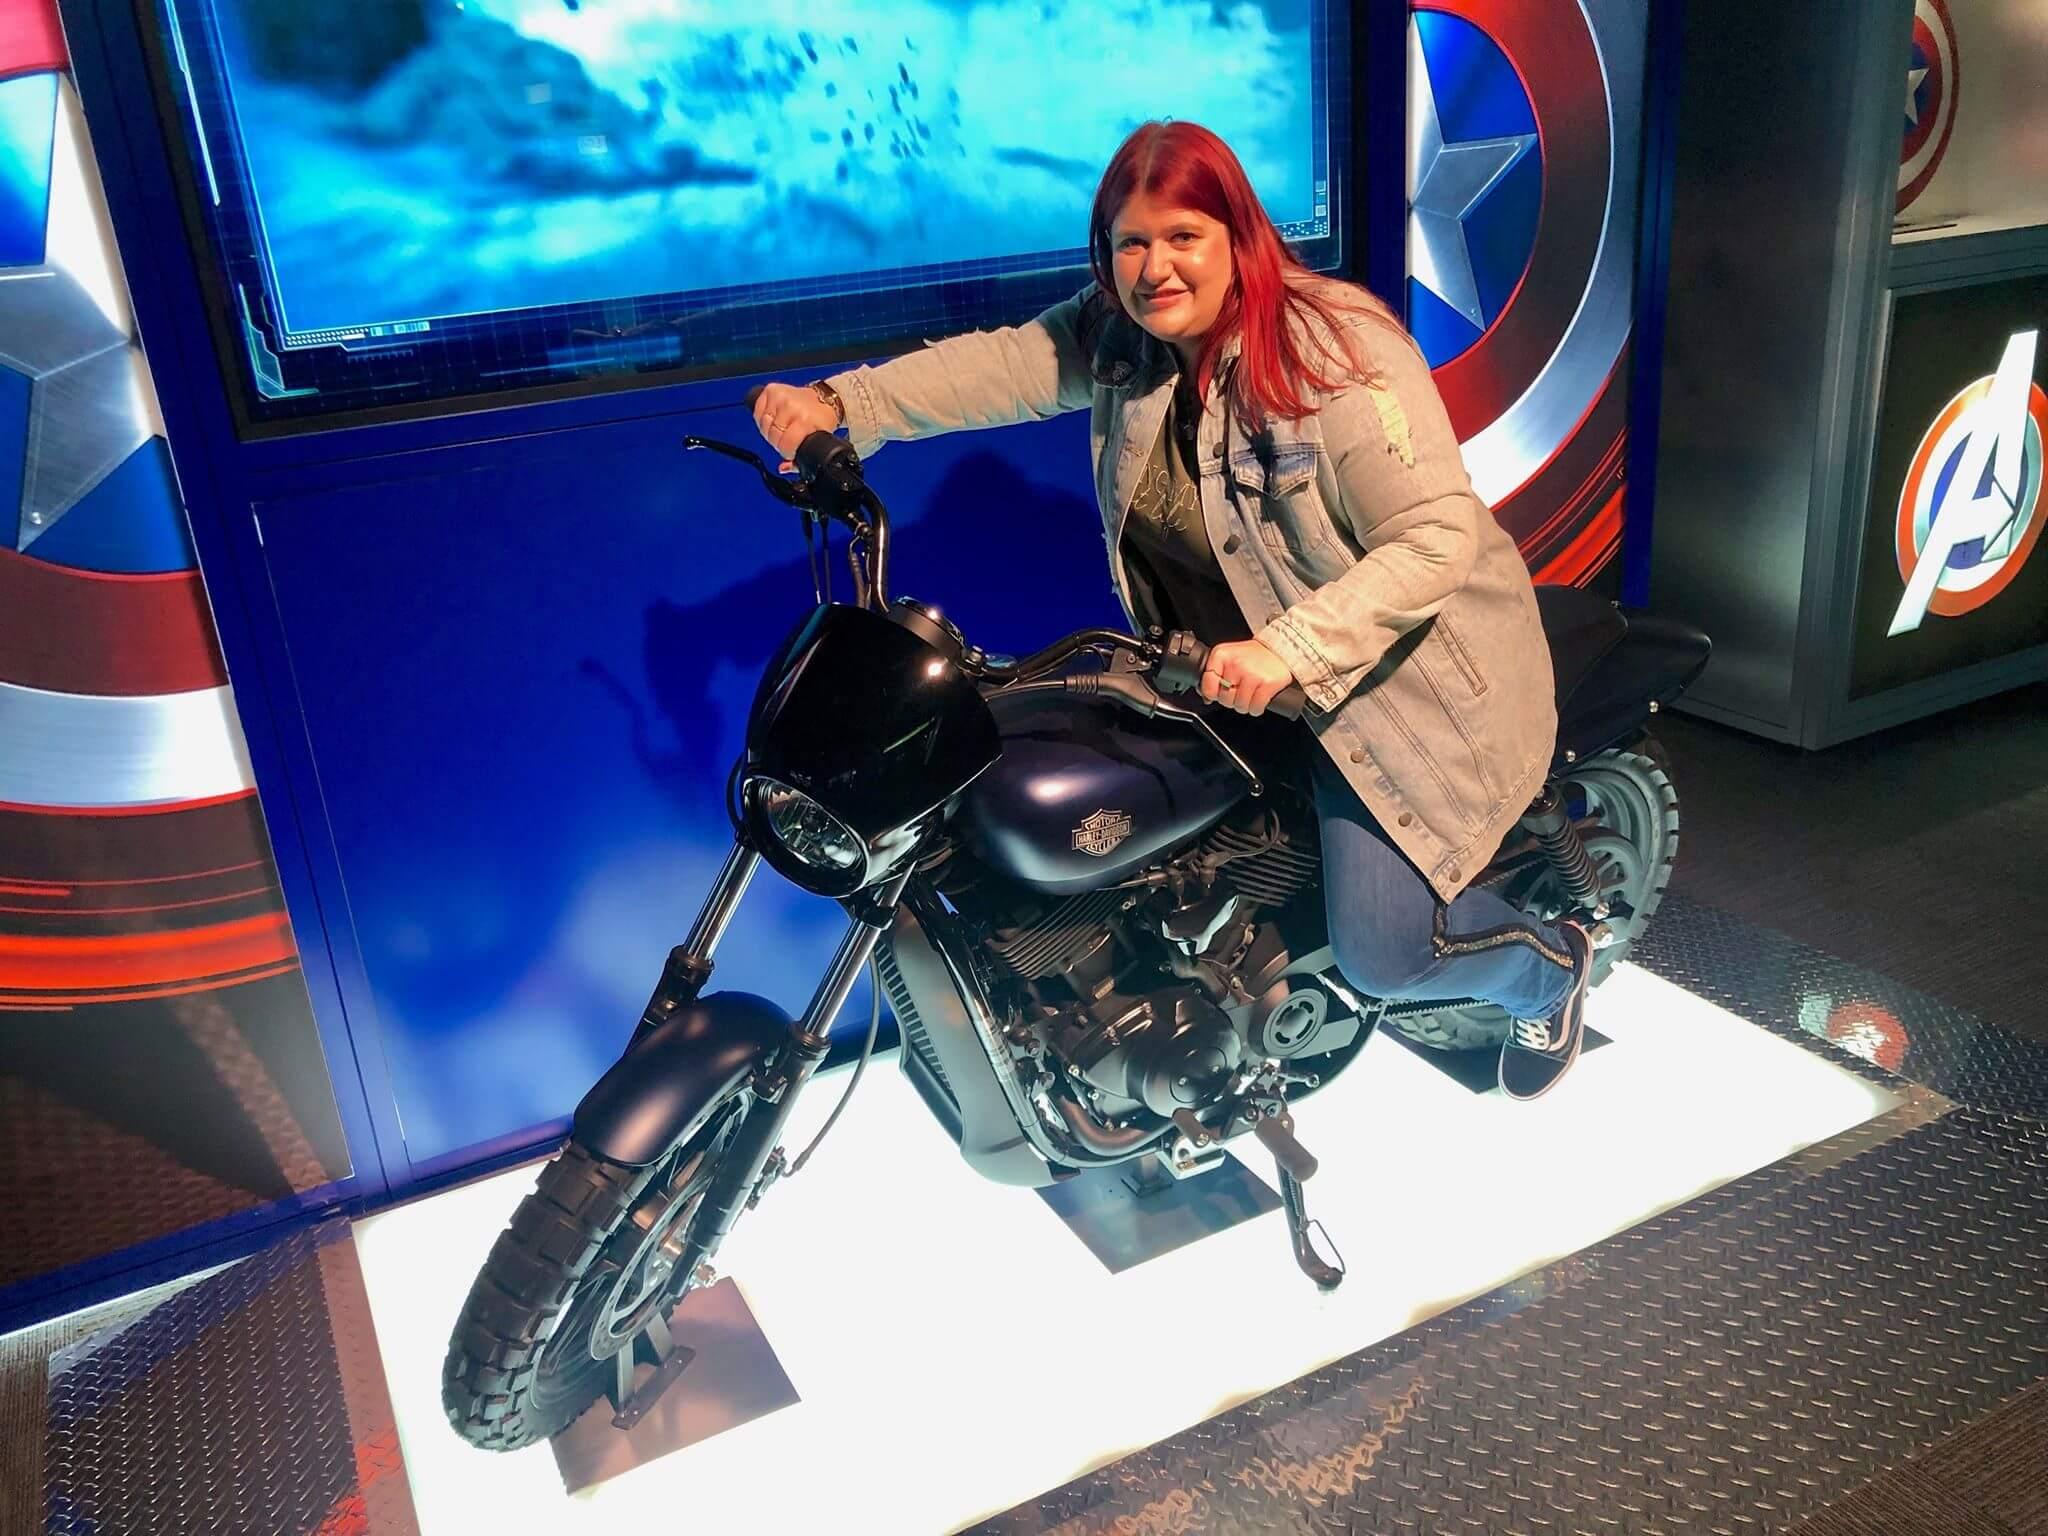 Me on a harley bike at avengers station